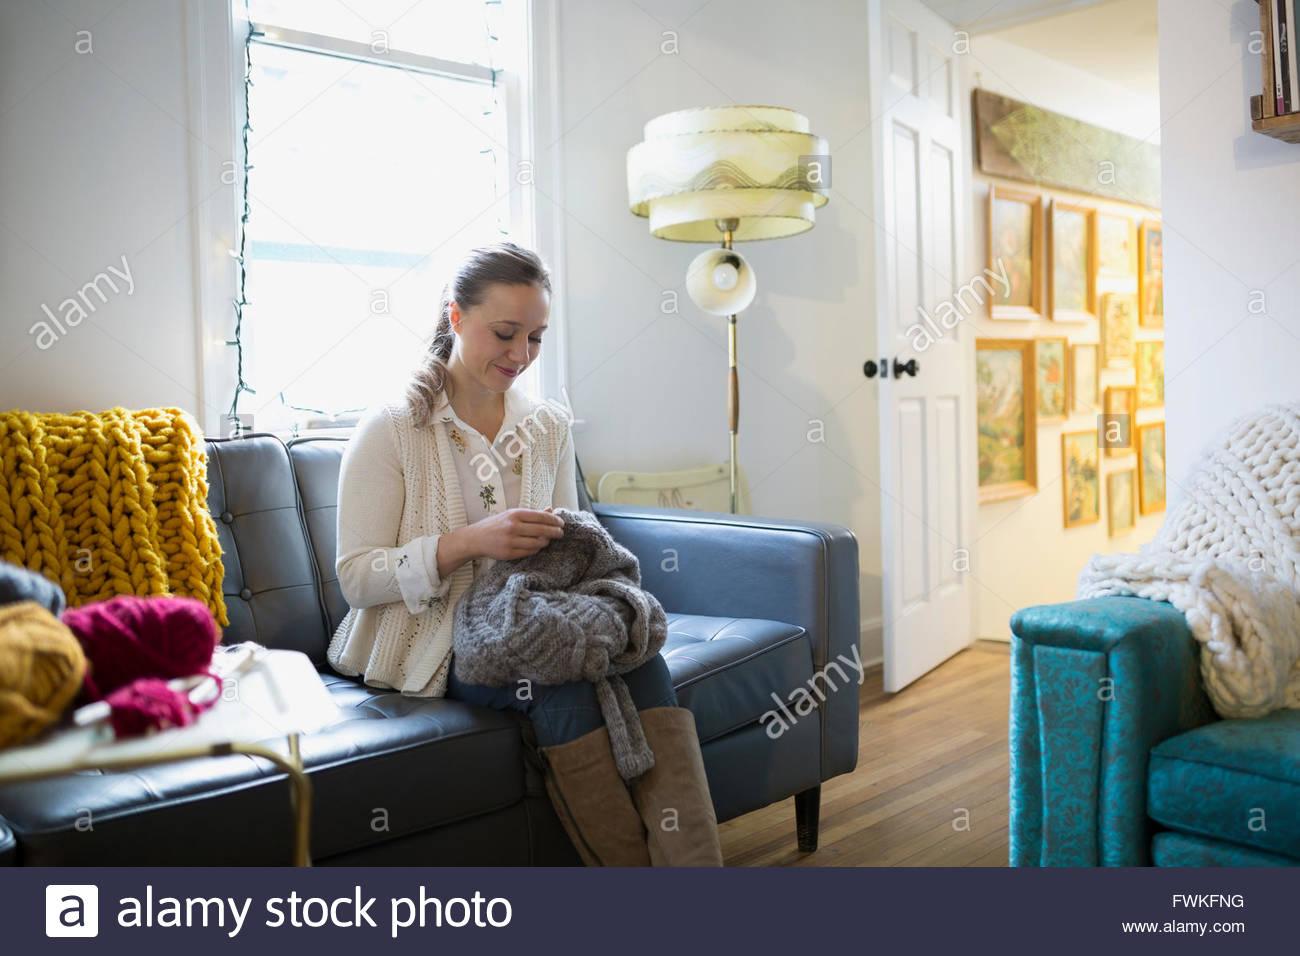 Pull tricot femme sur canapé Photo Stock